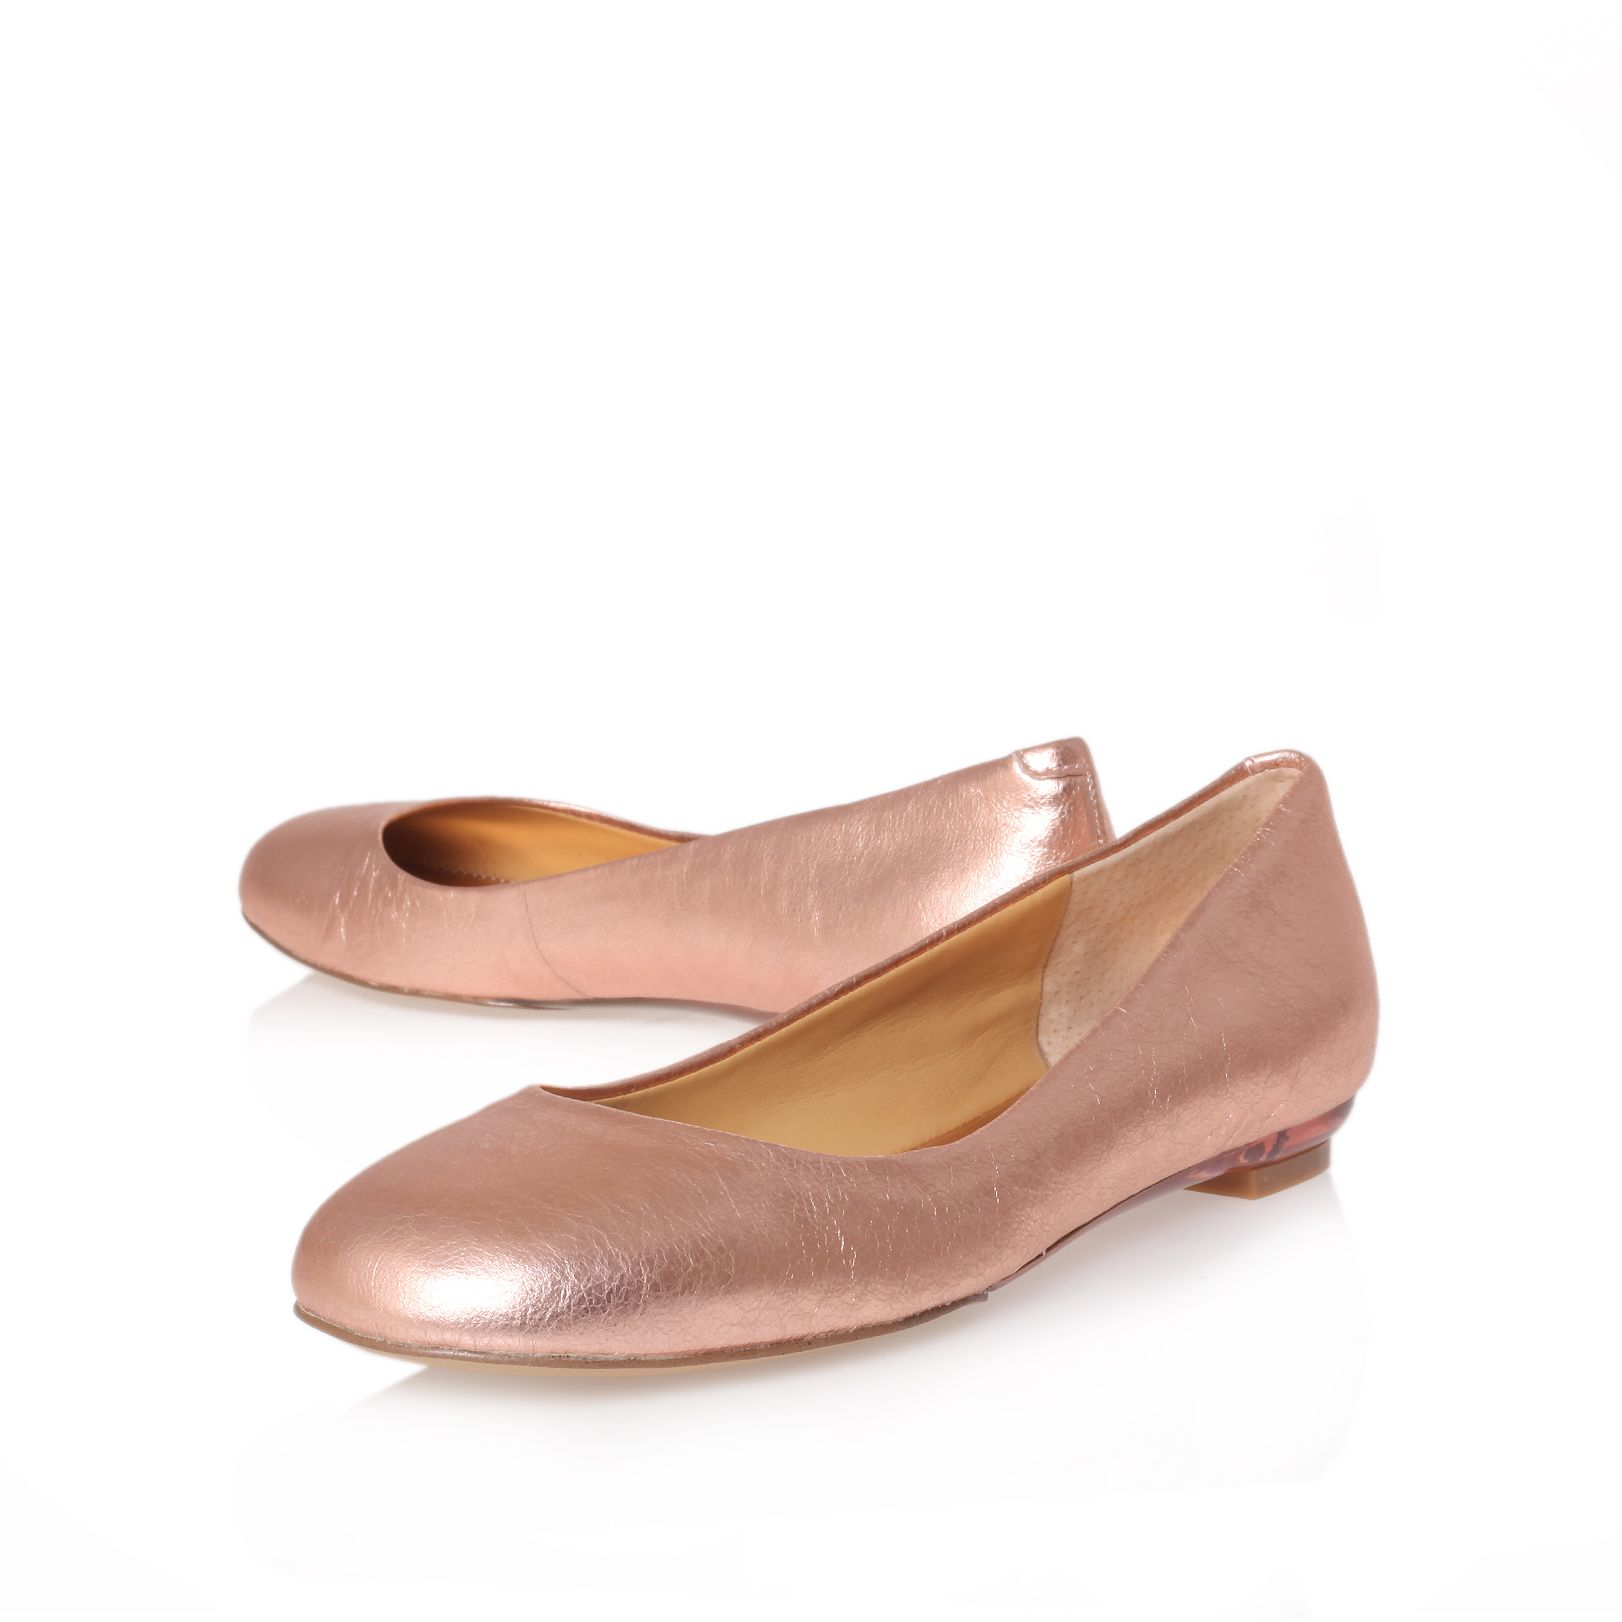 Nine West Shoes Womens Flats